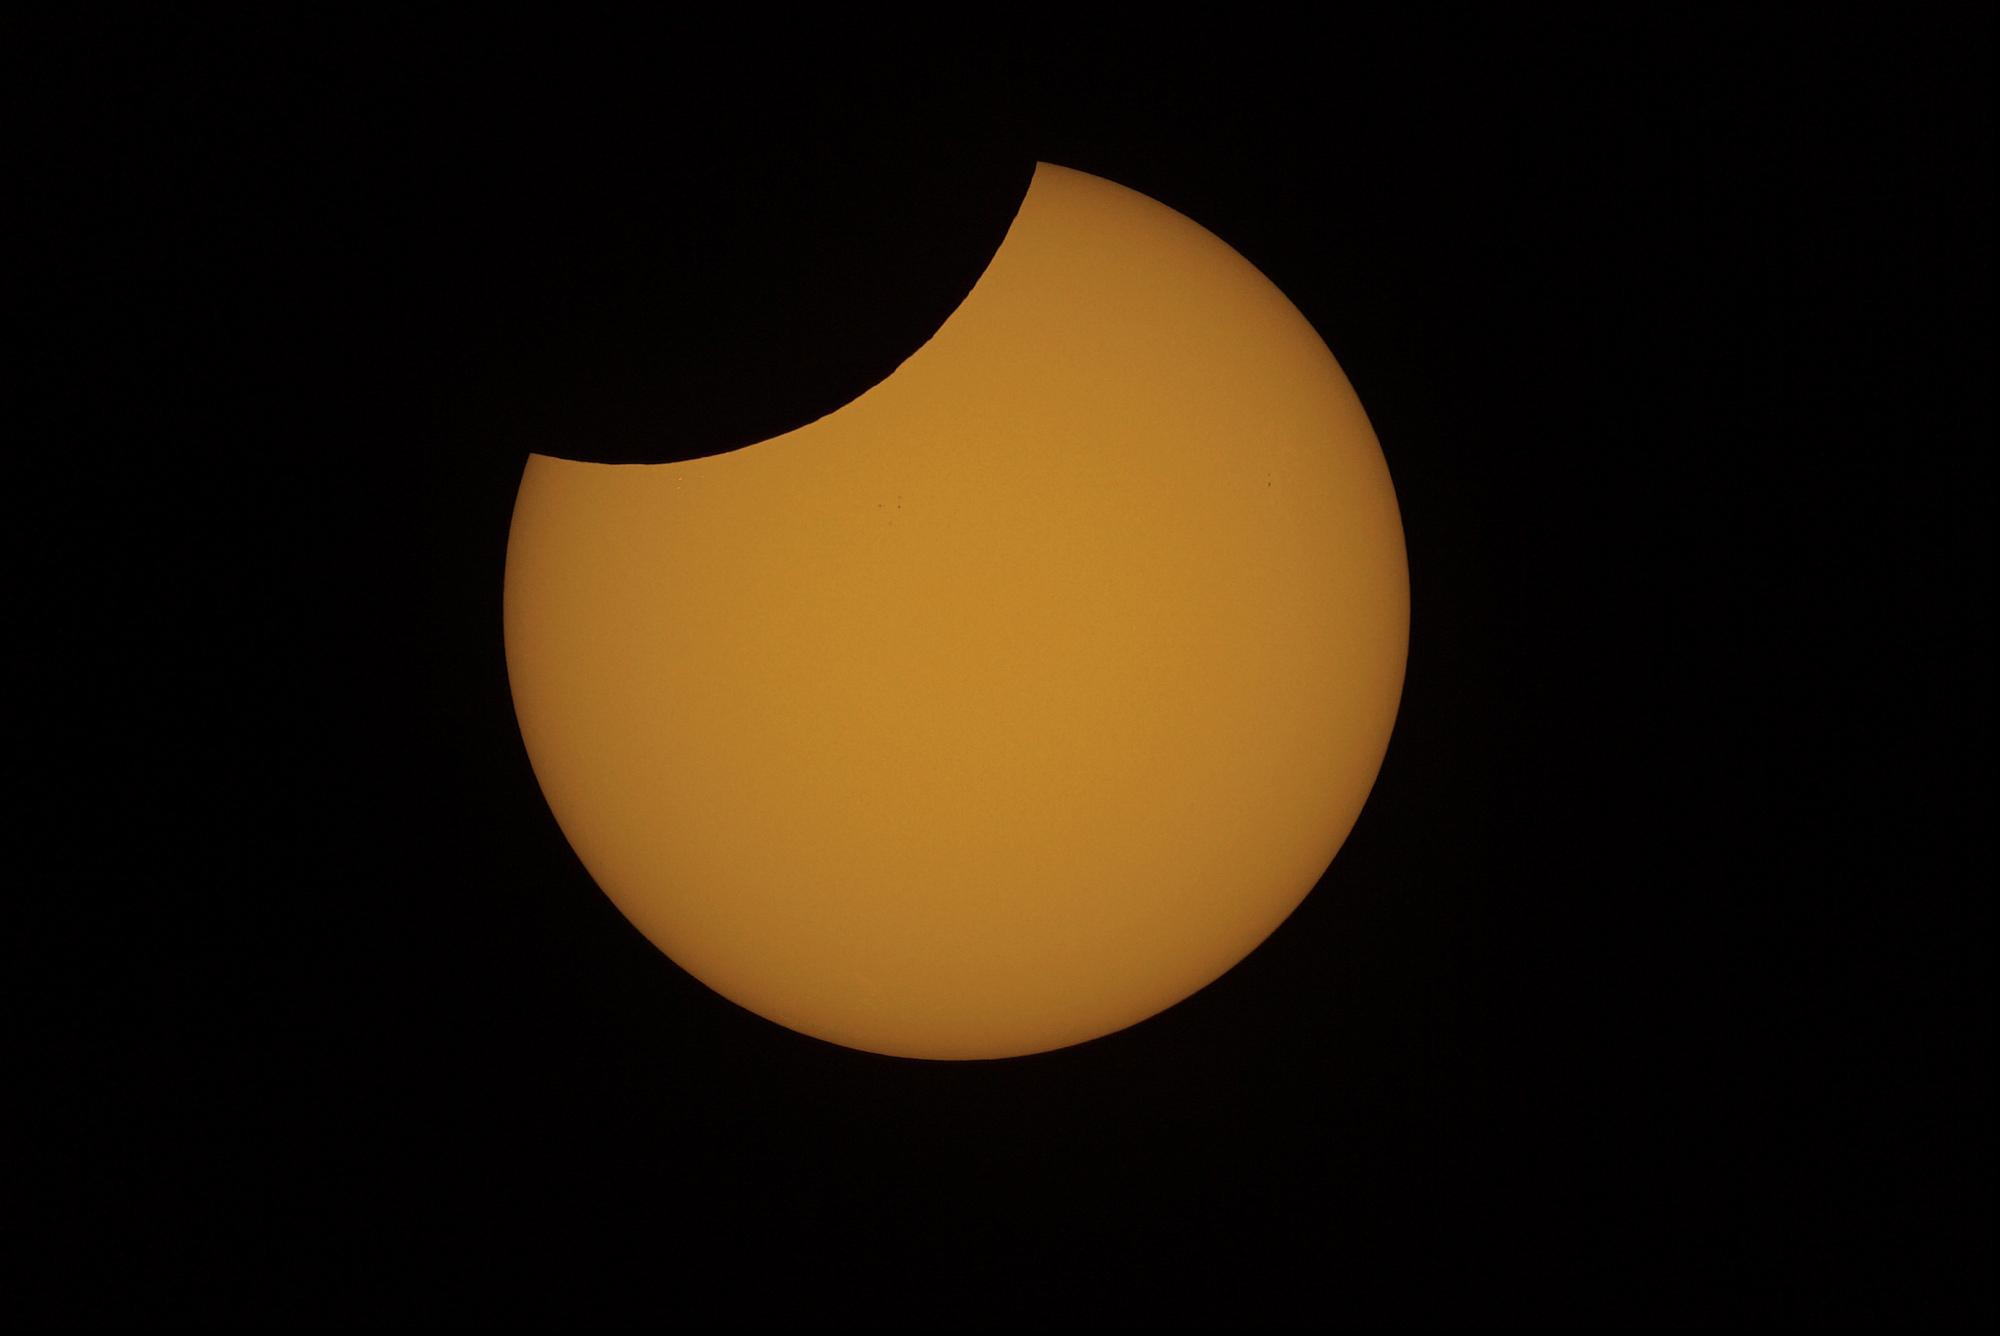 eclipse100621.thumb.jpg.25b48d85e26606b05fa56cbfb148baf9.jpg